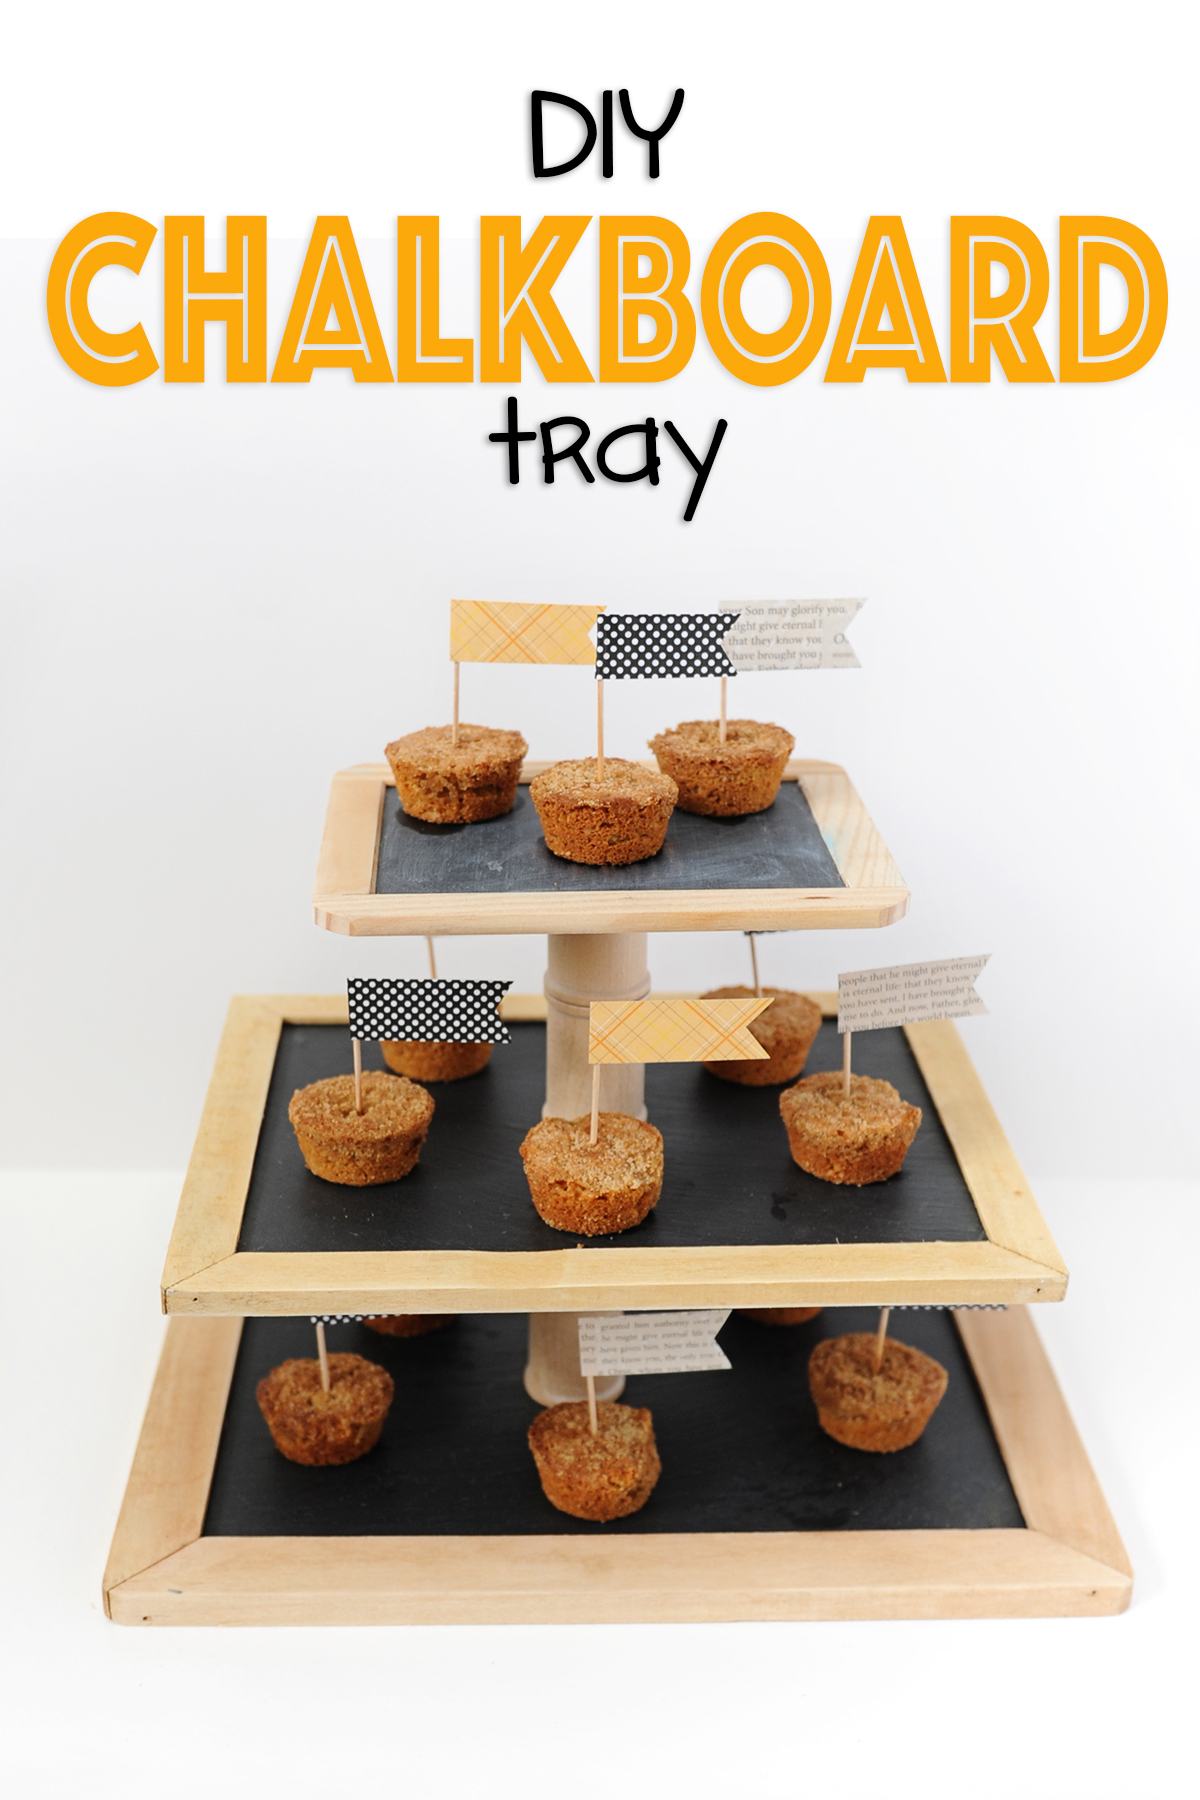 How To Make a Cute DIY Chalkboard Tray